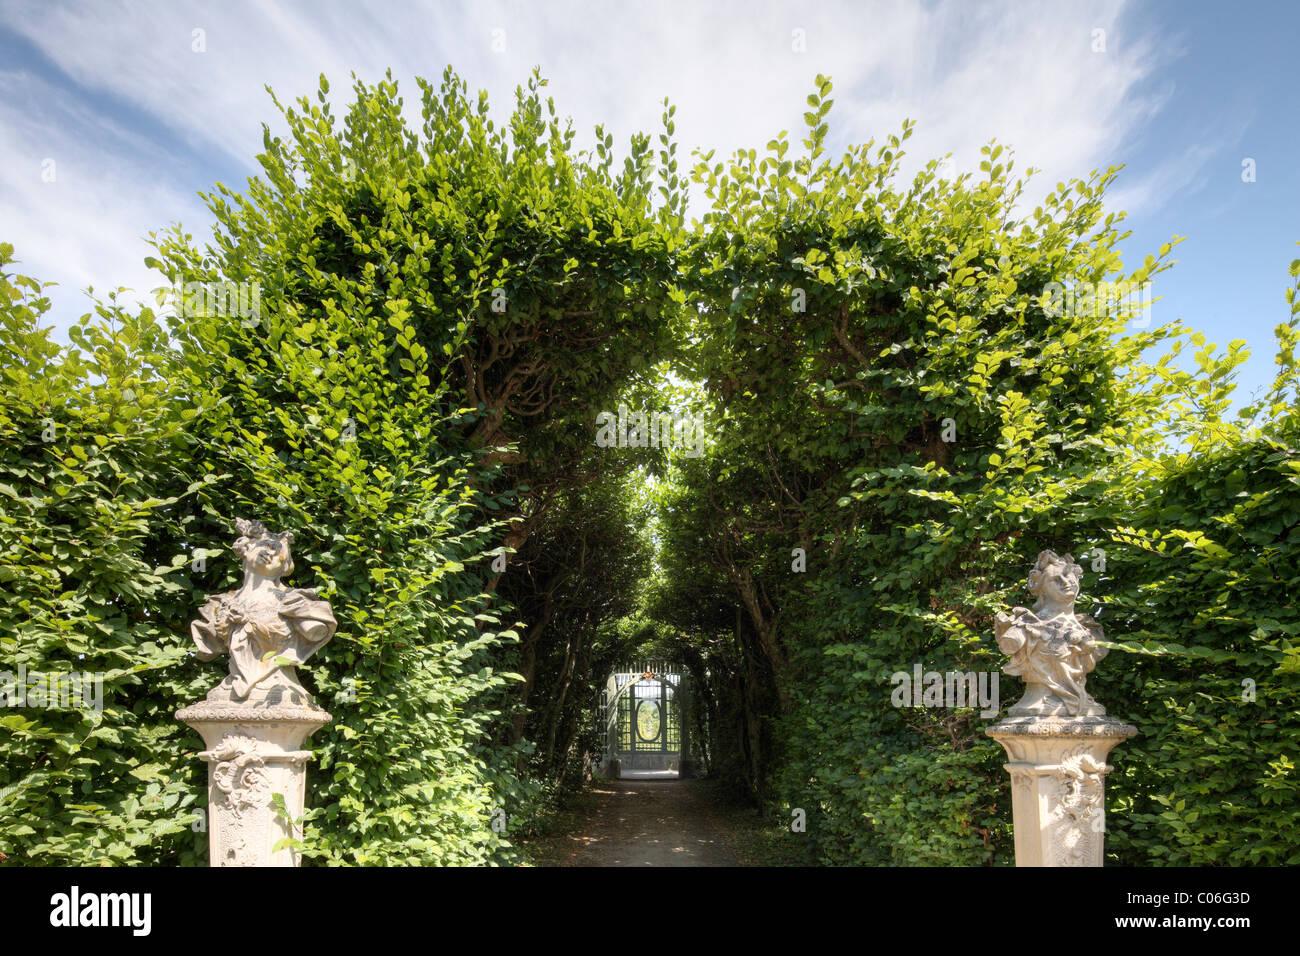 Le jardin rococo dans Main-Franconia Veitshoechheim, région, en Basse-franconie, Franconia, Bavaria, Germany, Photo Stock